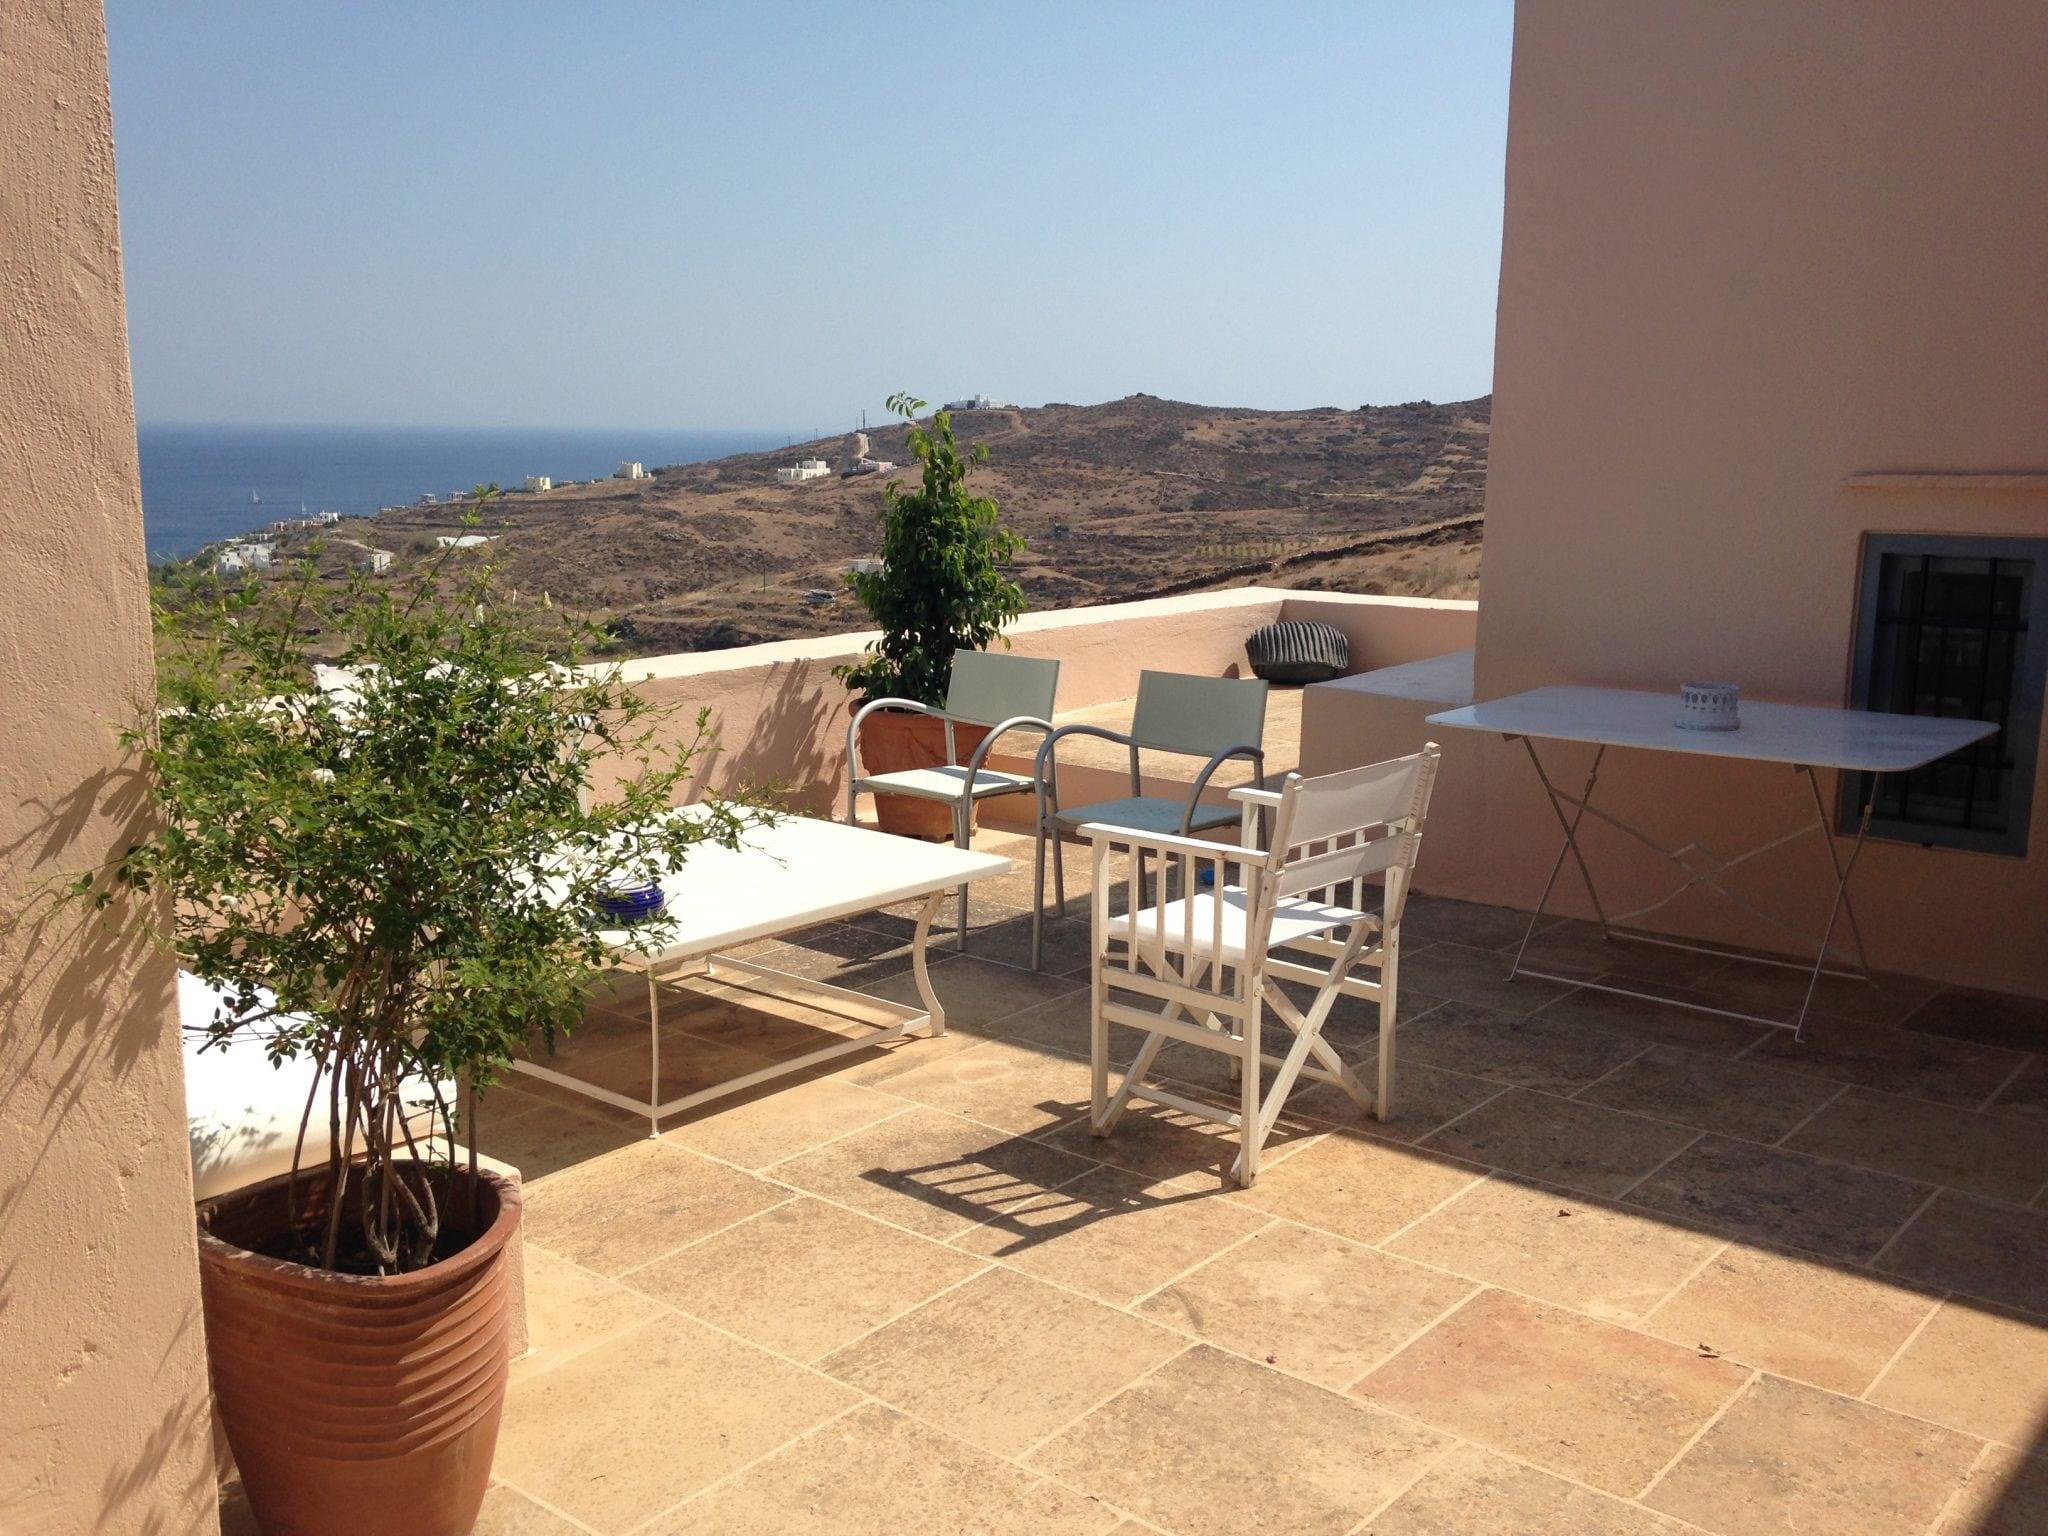 House, Syros - Ref GR-4351